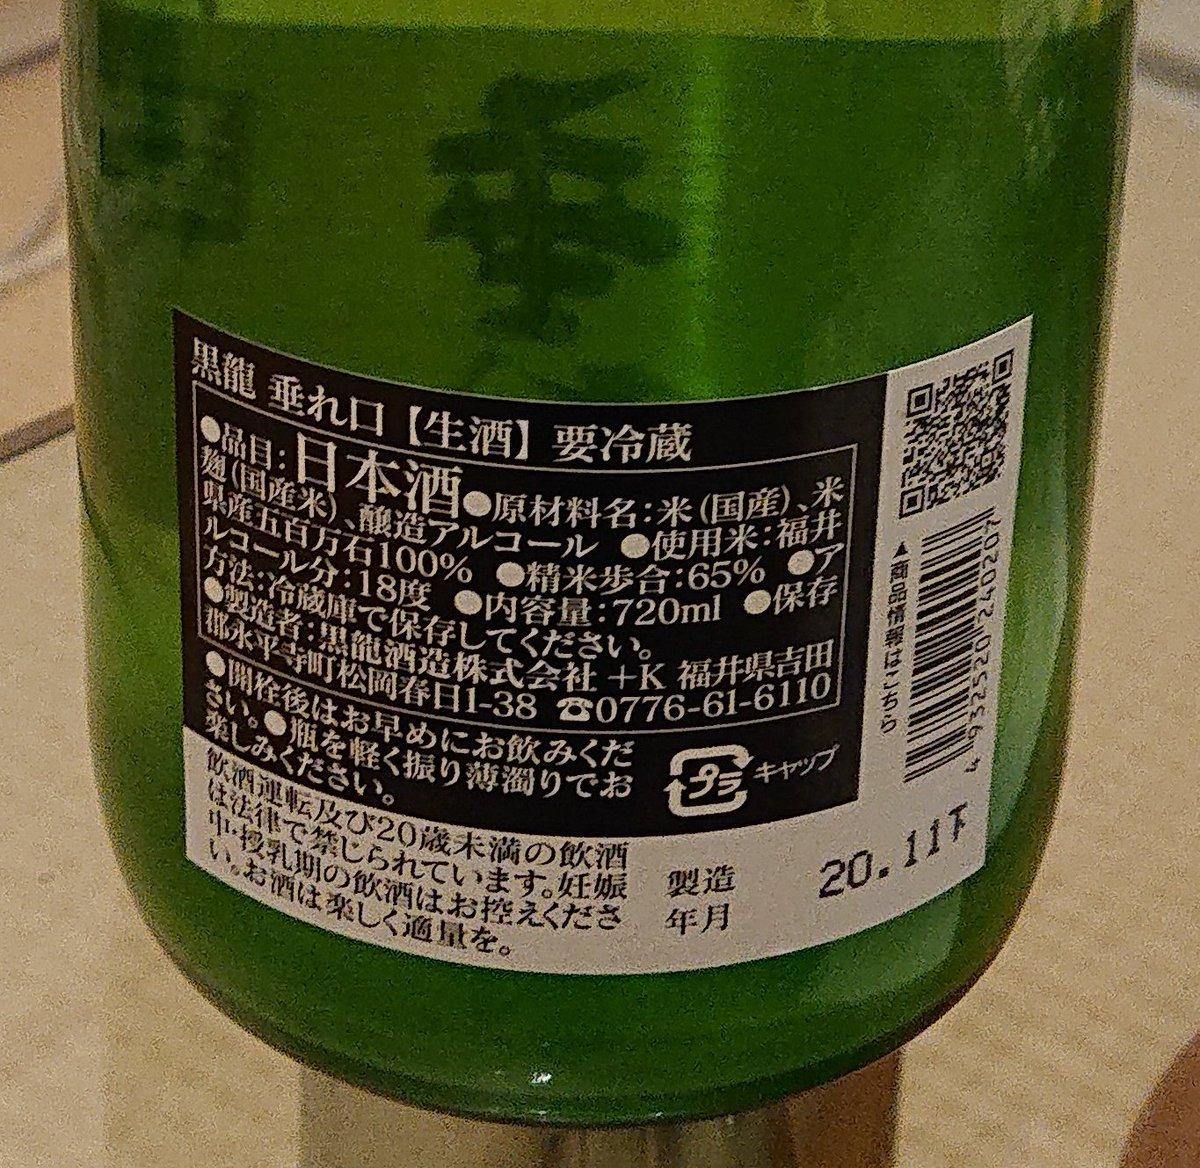 test ツイッターメディア - 今日はこちら! 黒龍 垂れ口 生酒 メロンのような香り。 飲み口は甘い味わい。 その後香りが口に広がり後の余韻には甘みが残りつつフレッシュな香りがまた感じられる爽やかな日本酒✨度数高めなので飲みすぎ注意笑アル添の感じはあまりないかな😊 #日本酒 #黒龍 #垂れ口 #生酒 #福井 #家飲み https://t.co/4wmV8HBJ7e